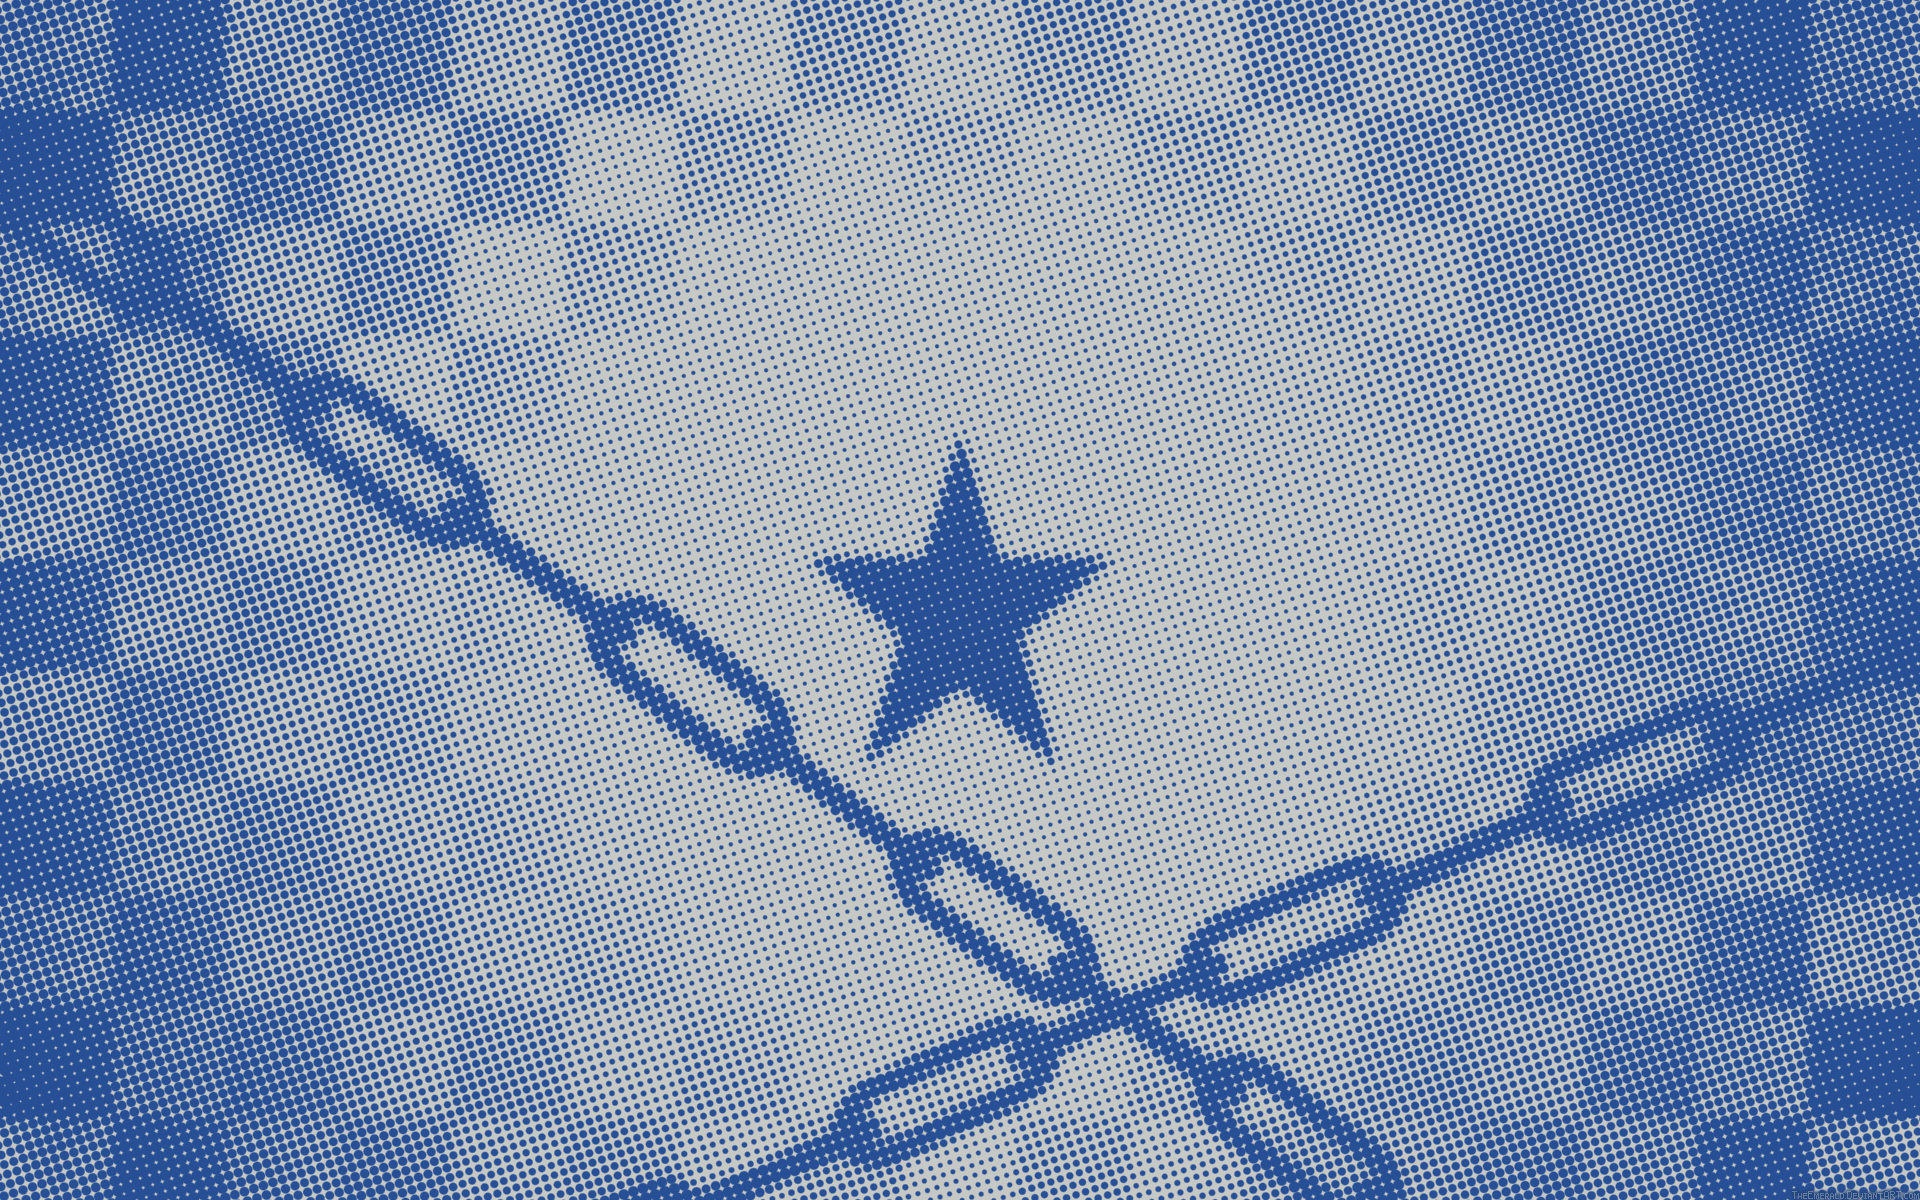 Anime 1920x1200 Black Rock Shooter blue white chains halftone pattern